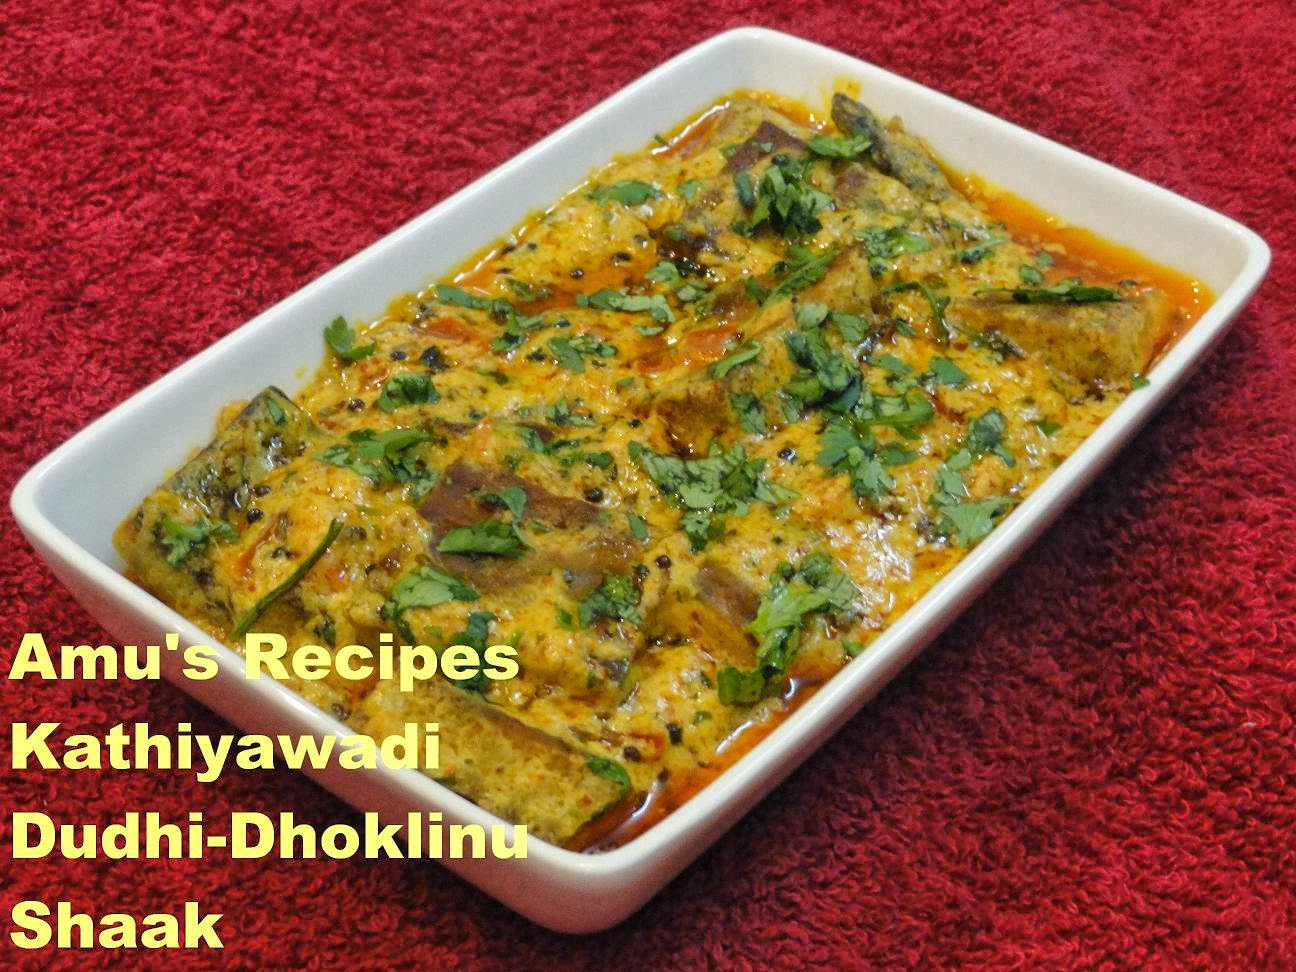 Amus recipes kathiyawadi dudhi dhoklinu shaak forumfinder Images